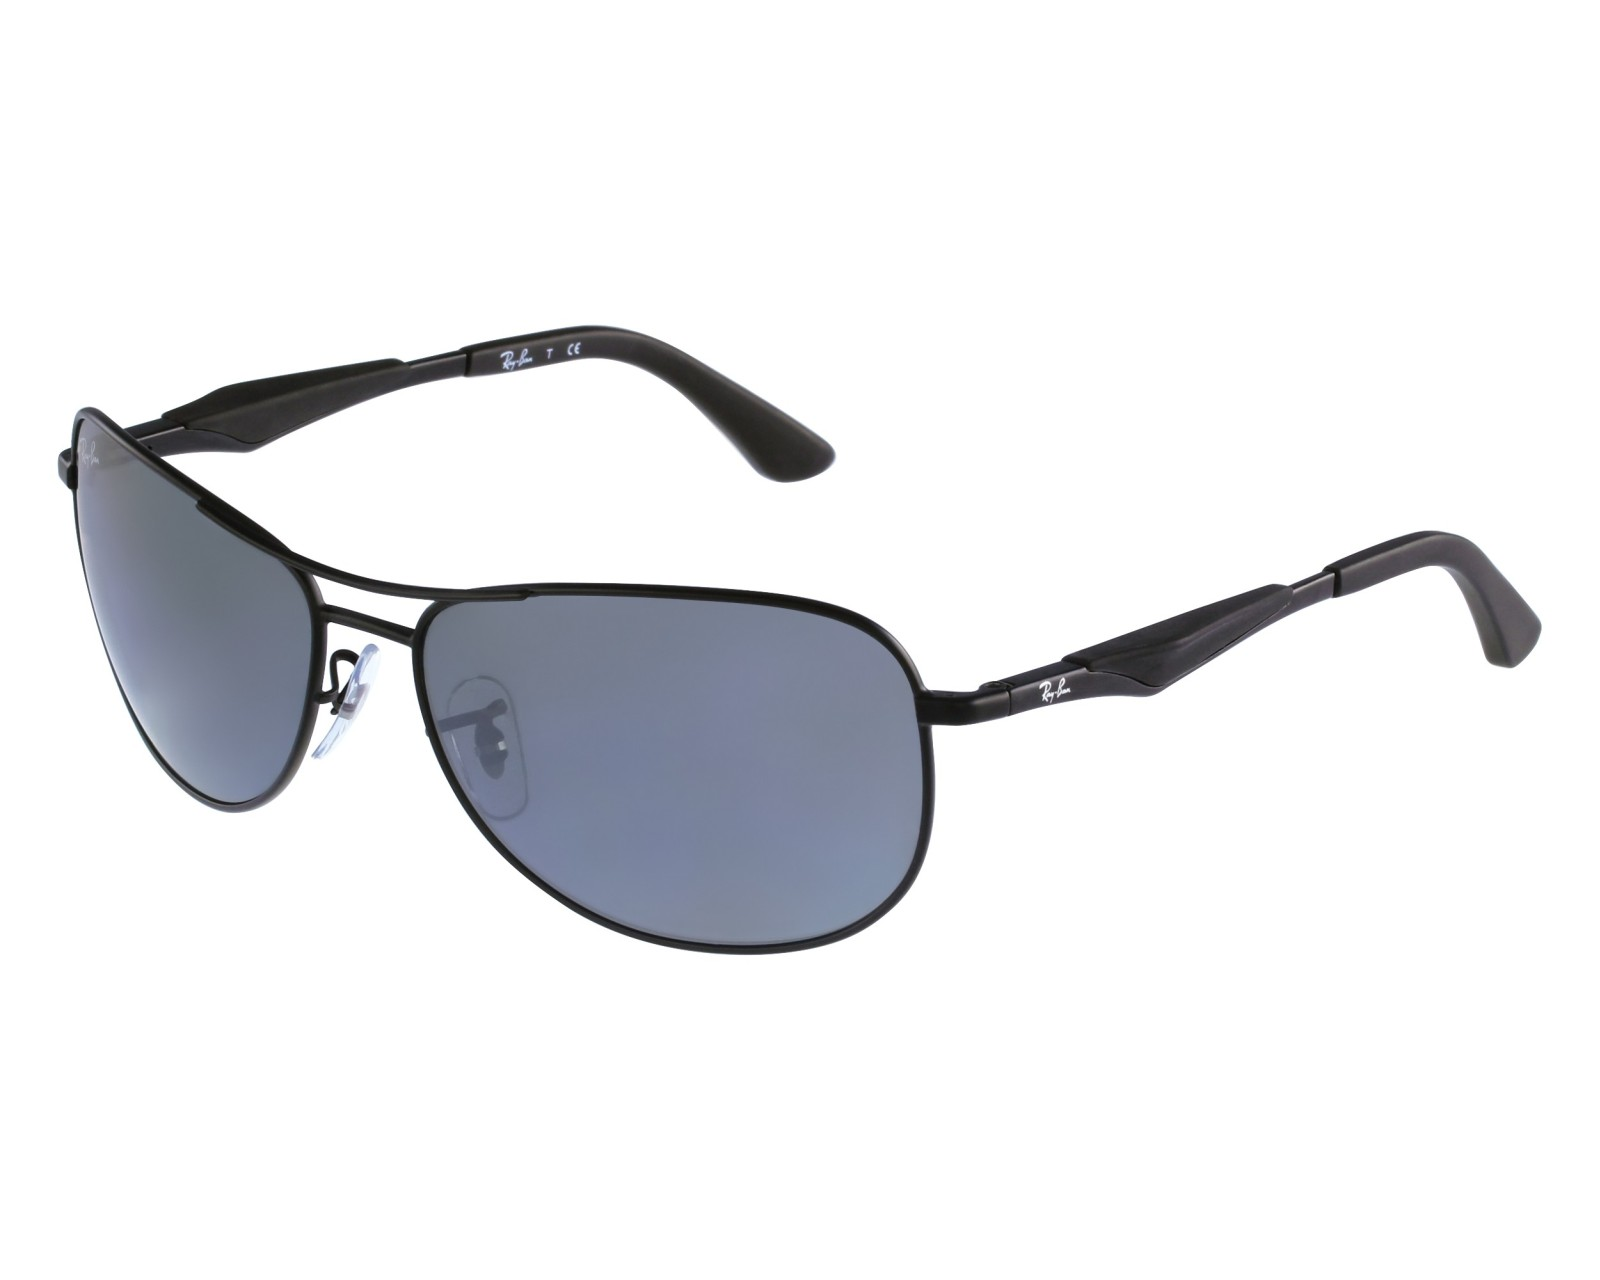 51a03deaae thumbnail Sunglasses Ray-Ban RB-3519 006 6G - Black front view